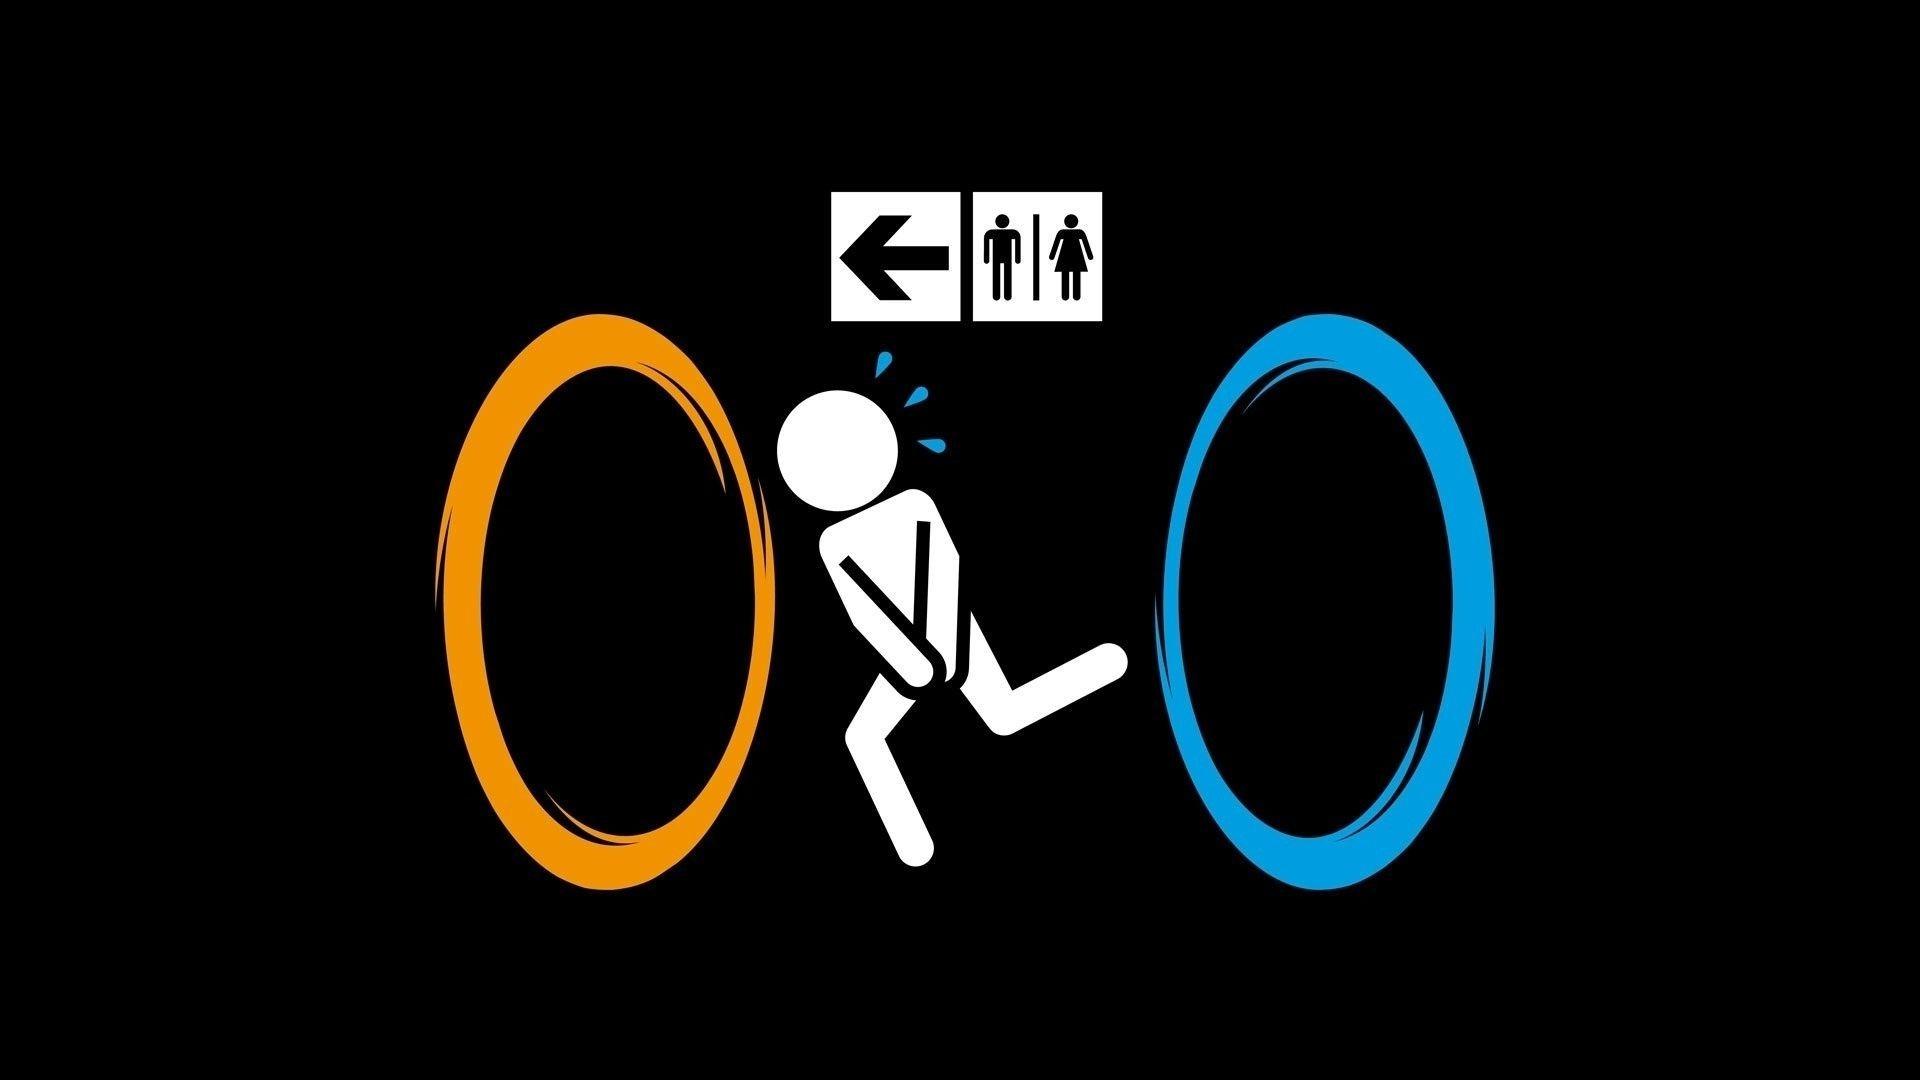 Portal 2 Toilet Humor Portal Phone Wallpapers